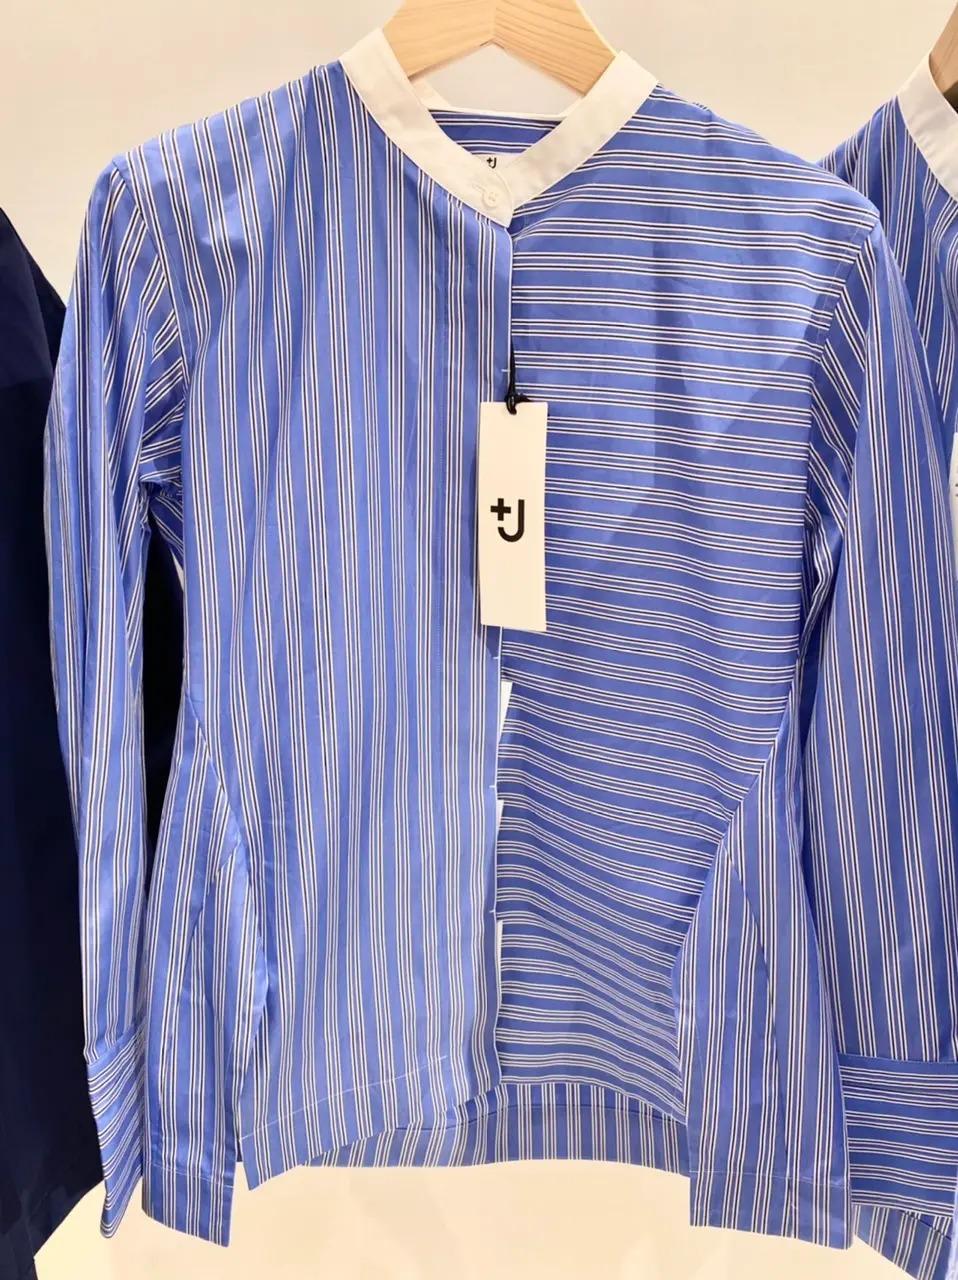 『+J(プラスジェイ)』のストライプシャツ